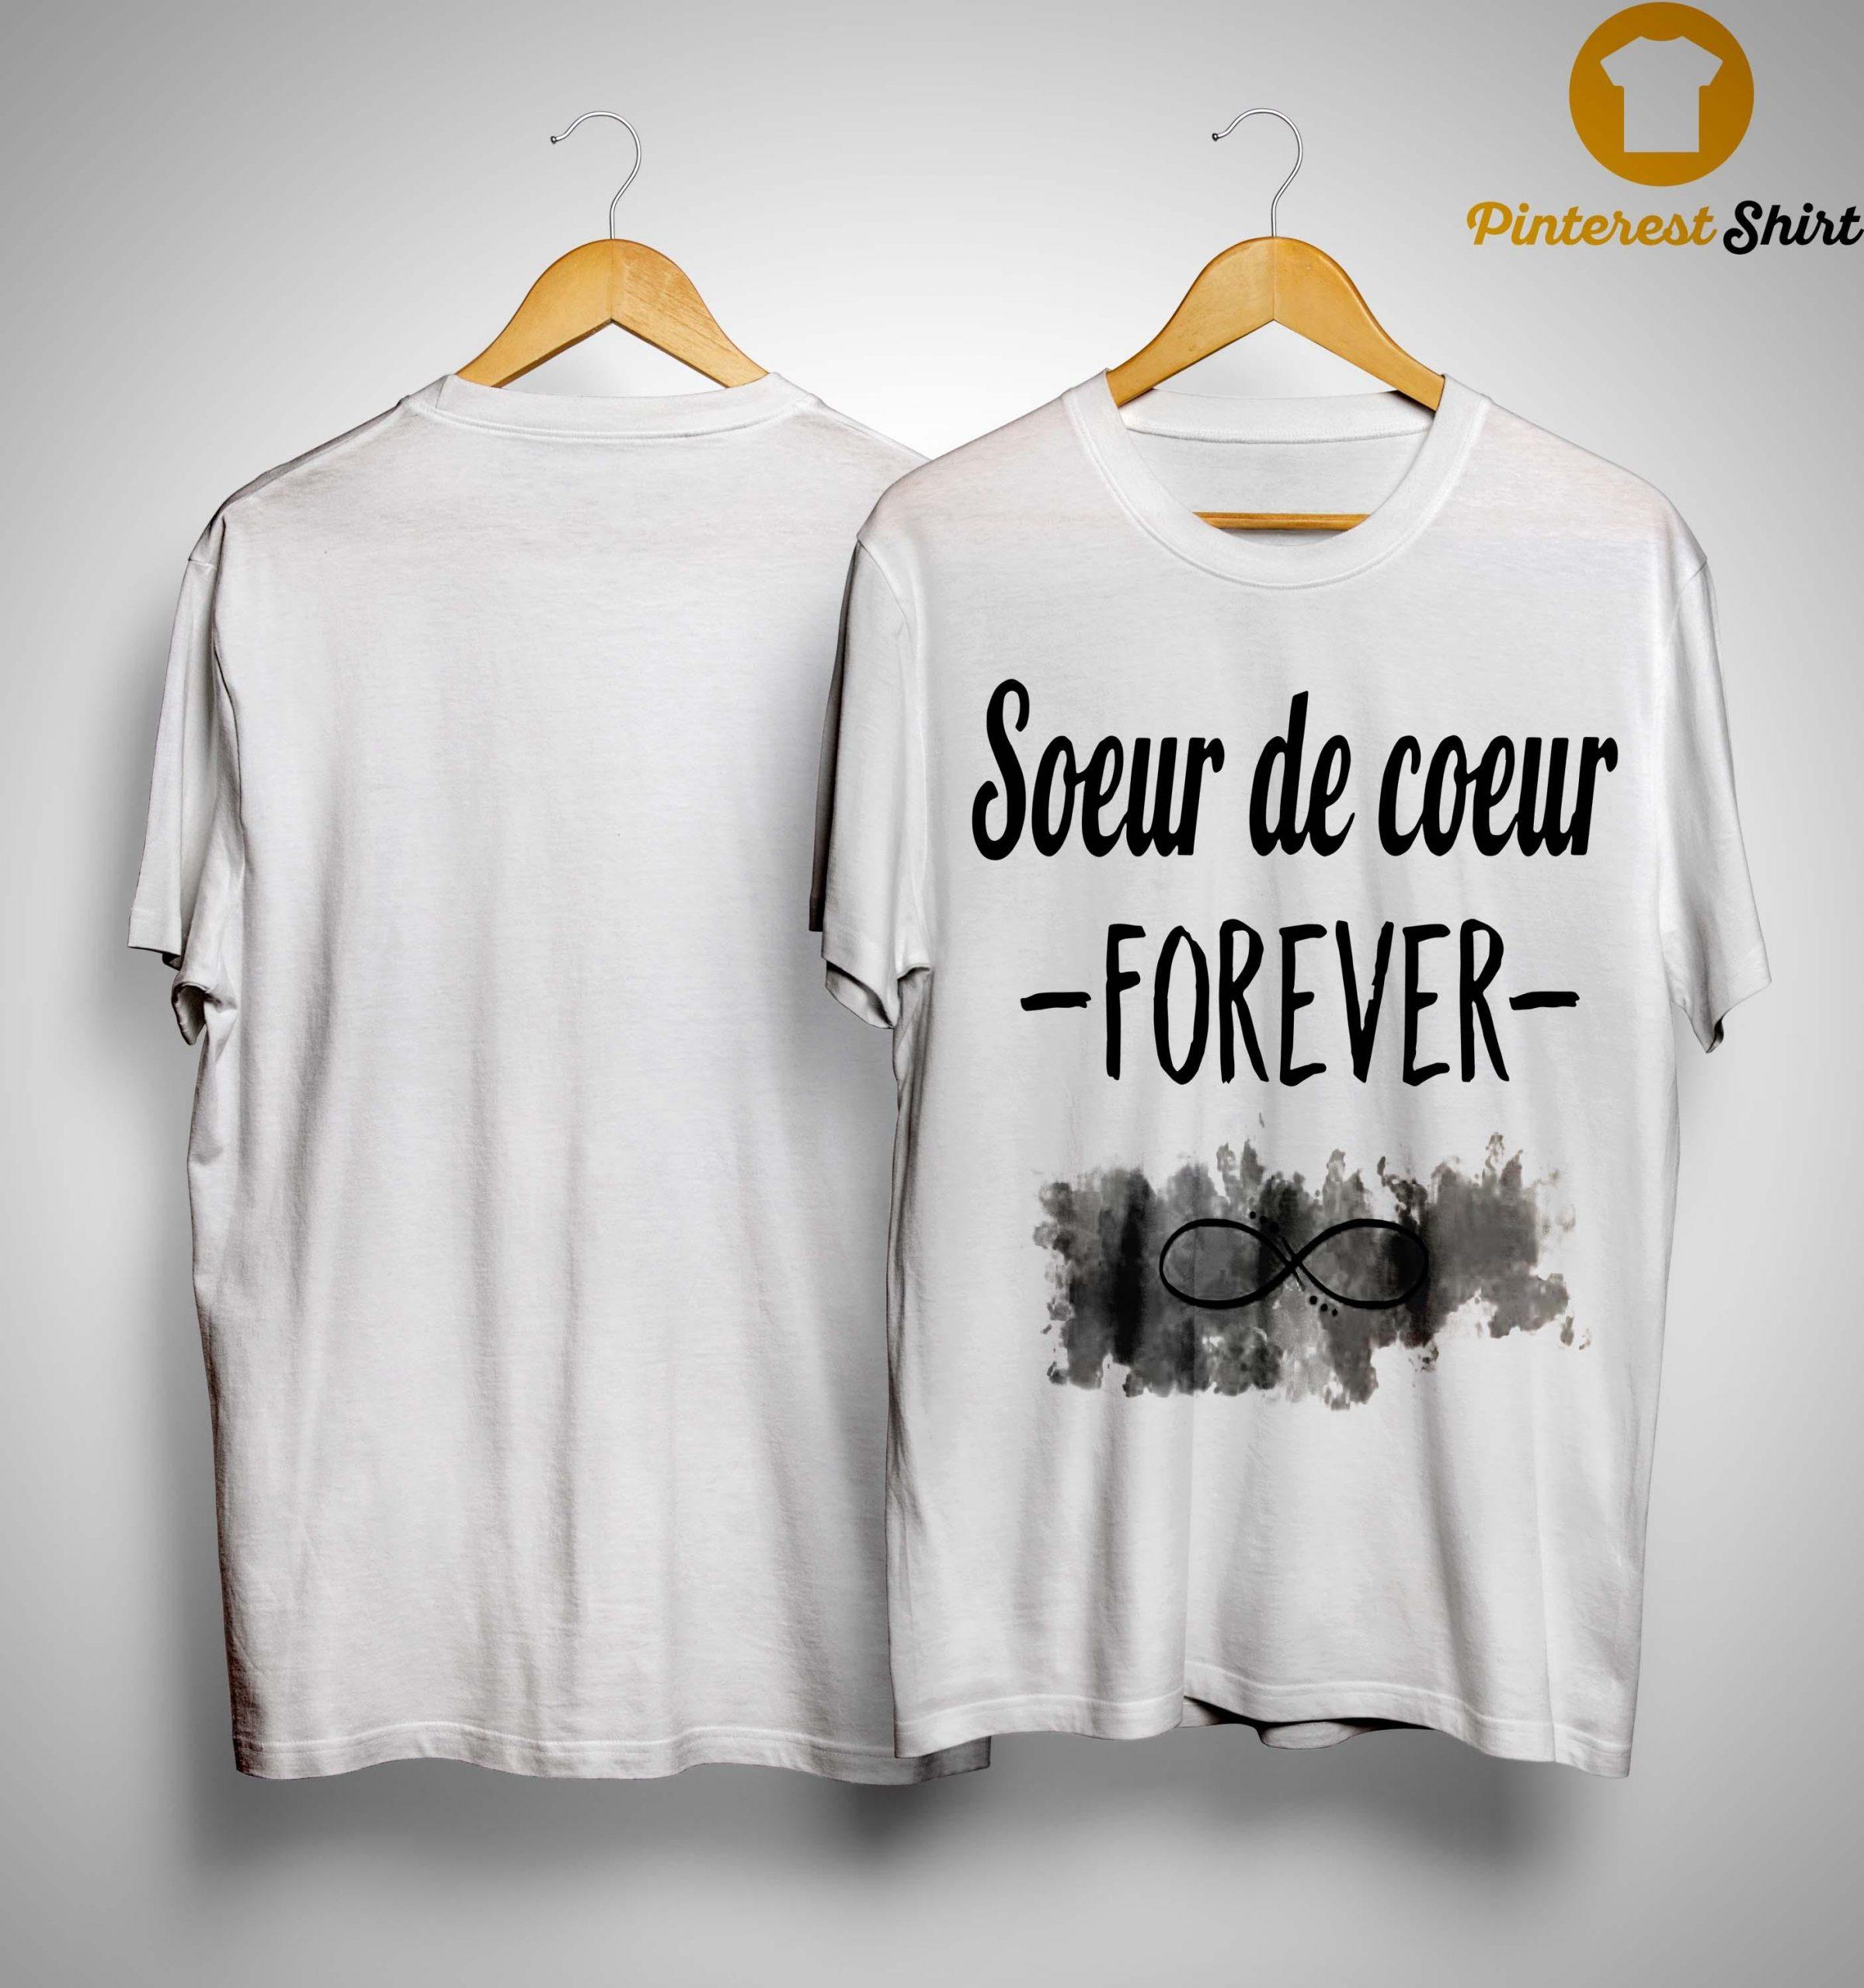 Soeur De Coeur Forever Shirt